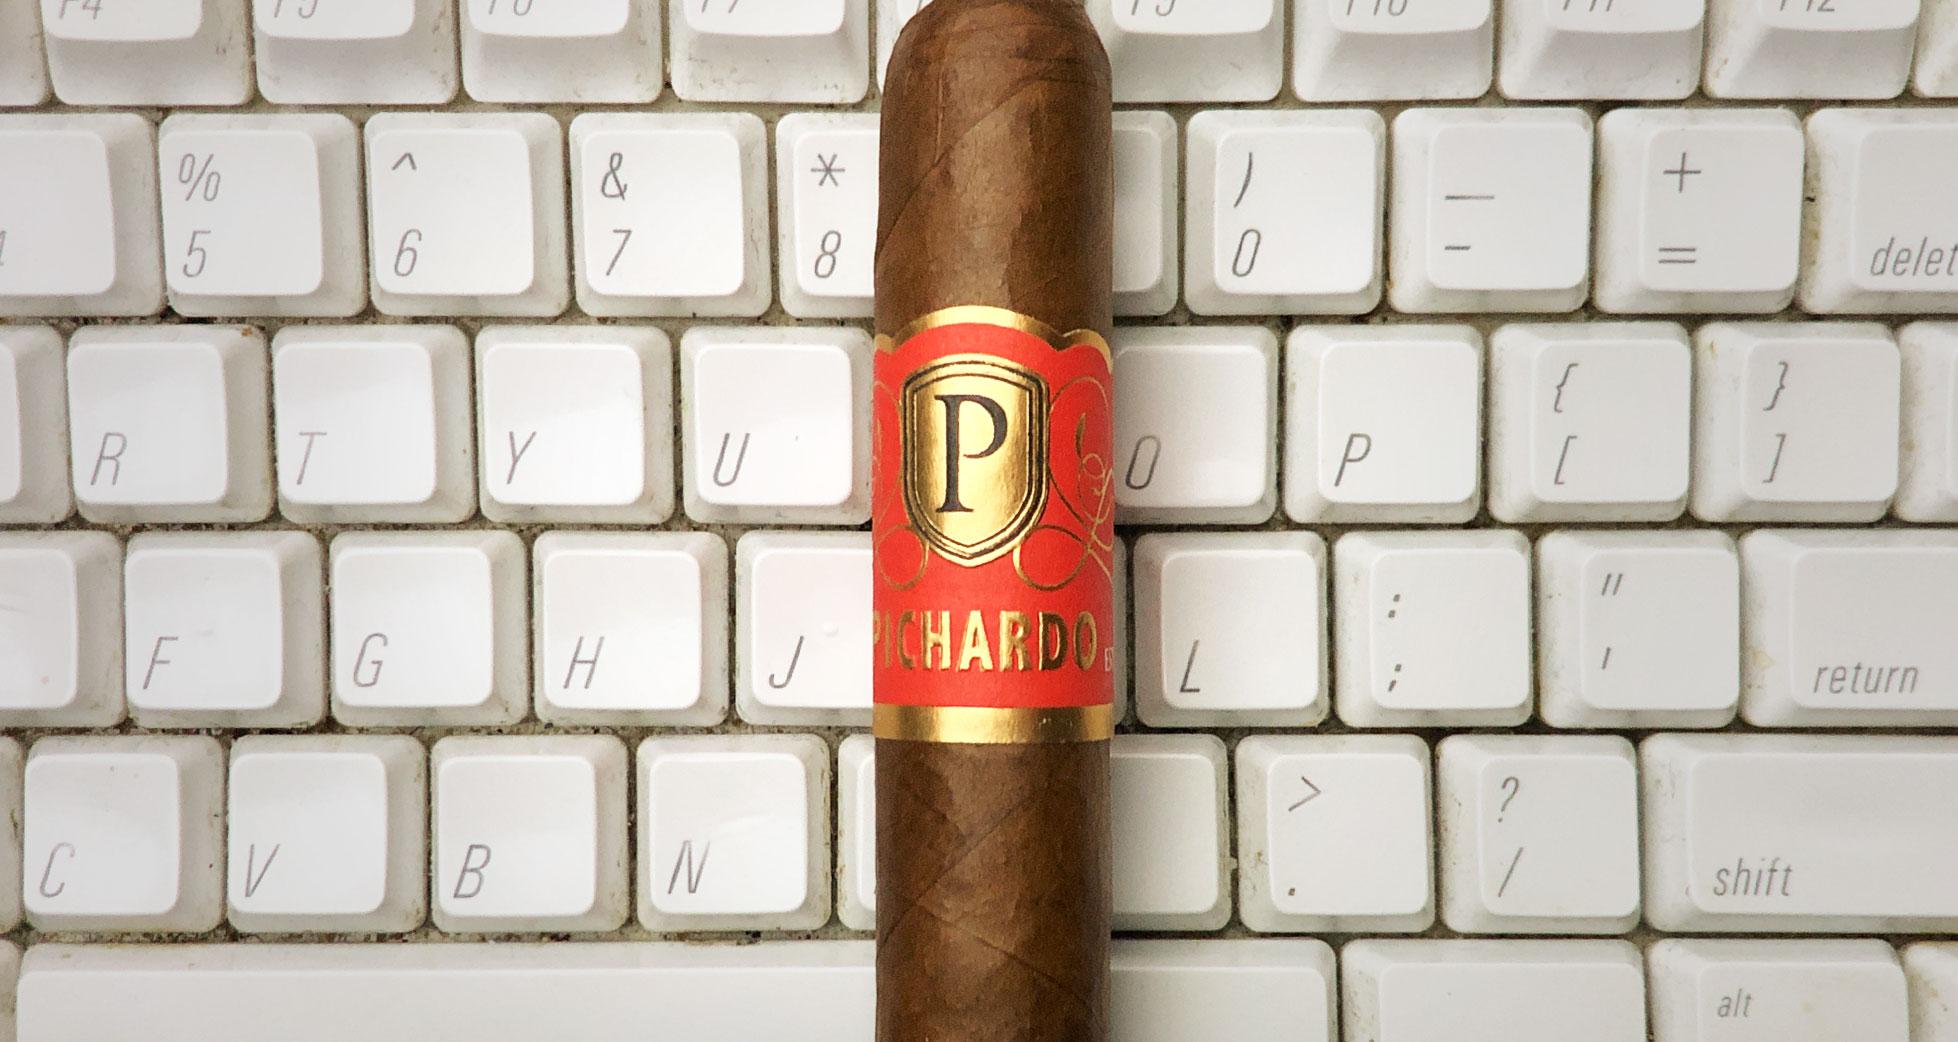 Pichardo Reserva Familia, Habano, Toro, A.C.E. Prime Cigars, Nicaraguan Habano, Nicaragua